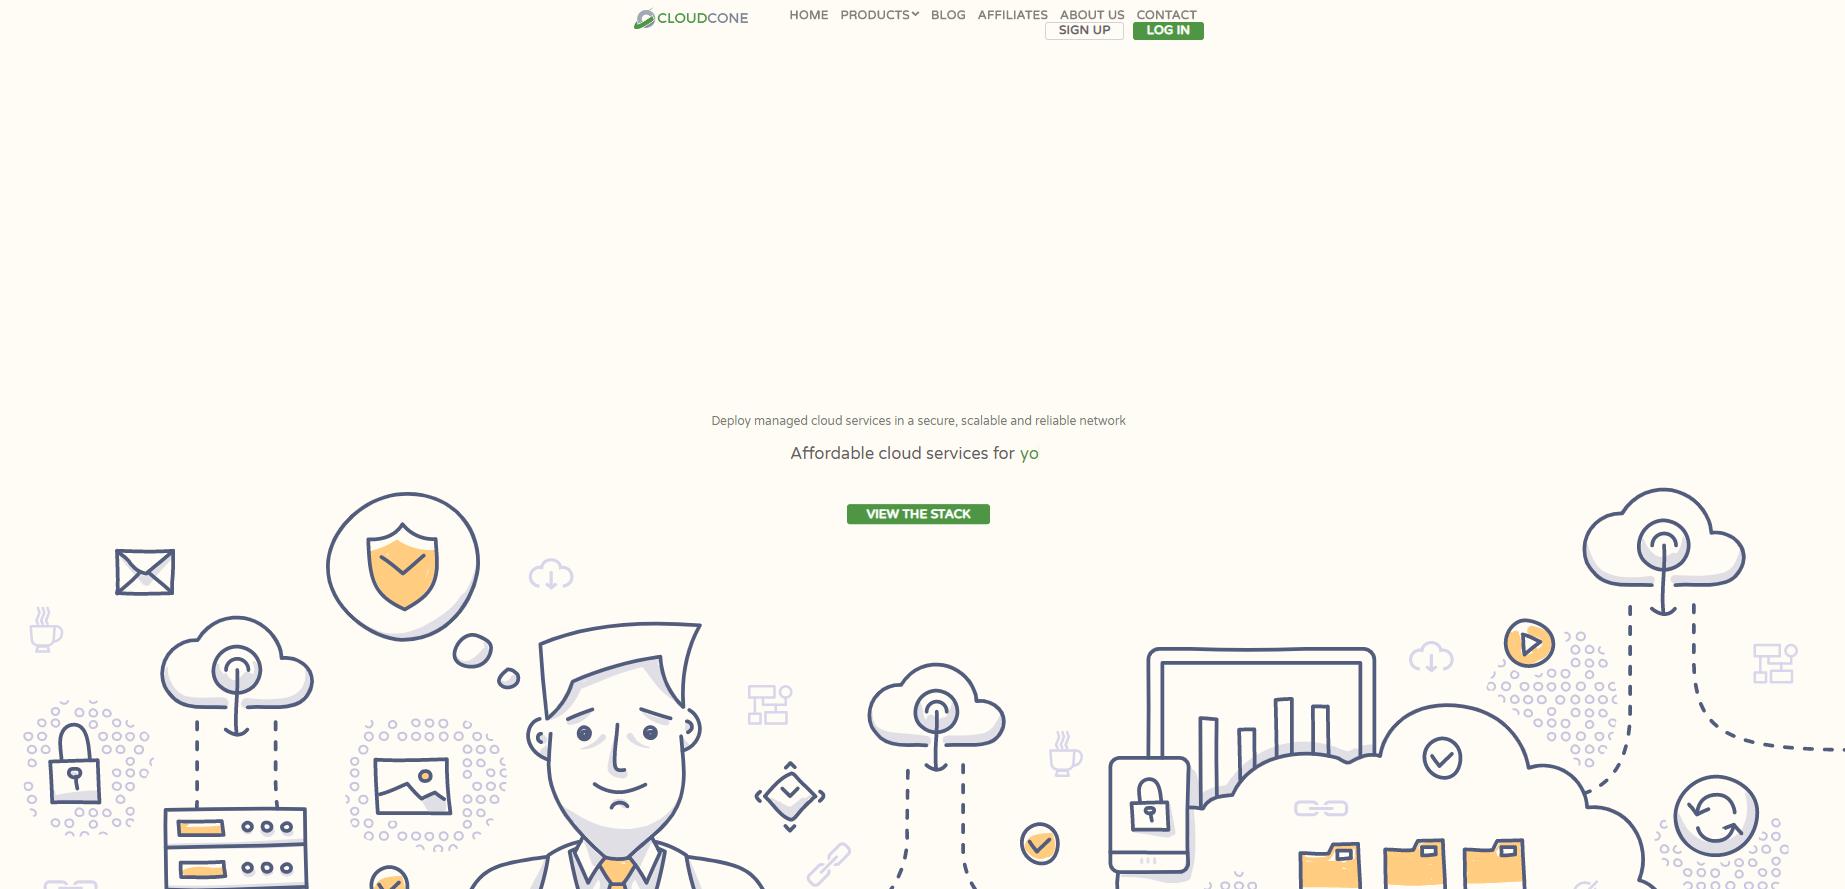 CloudCone官网首页